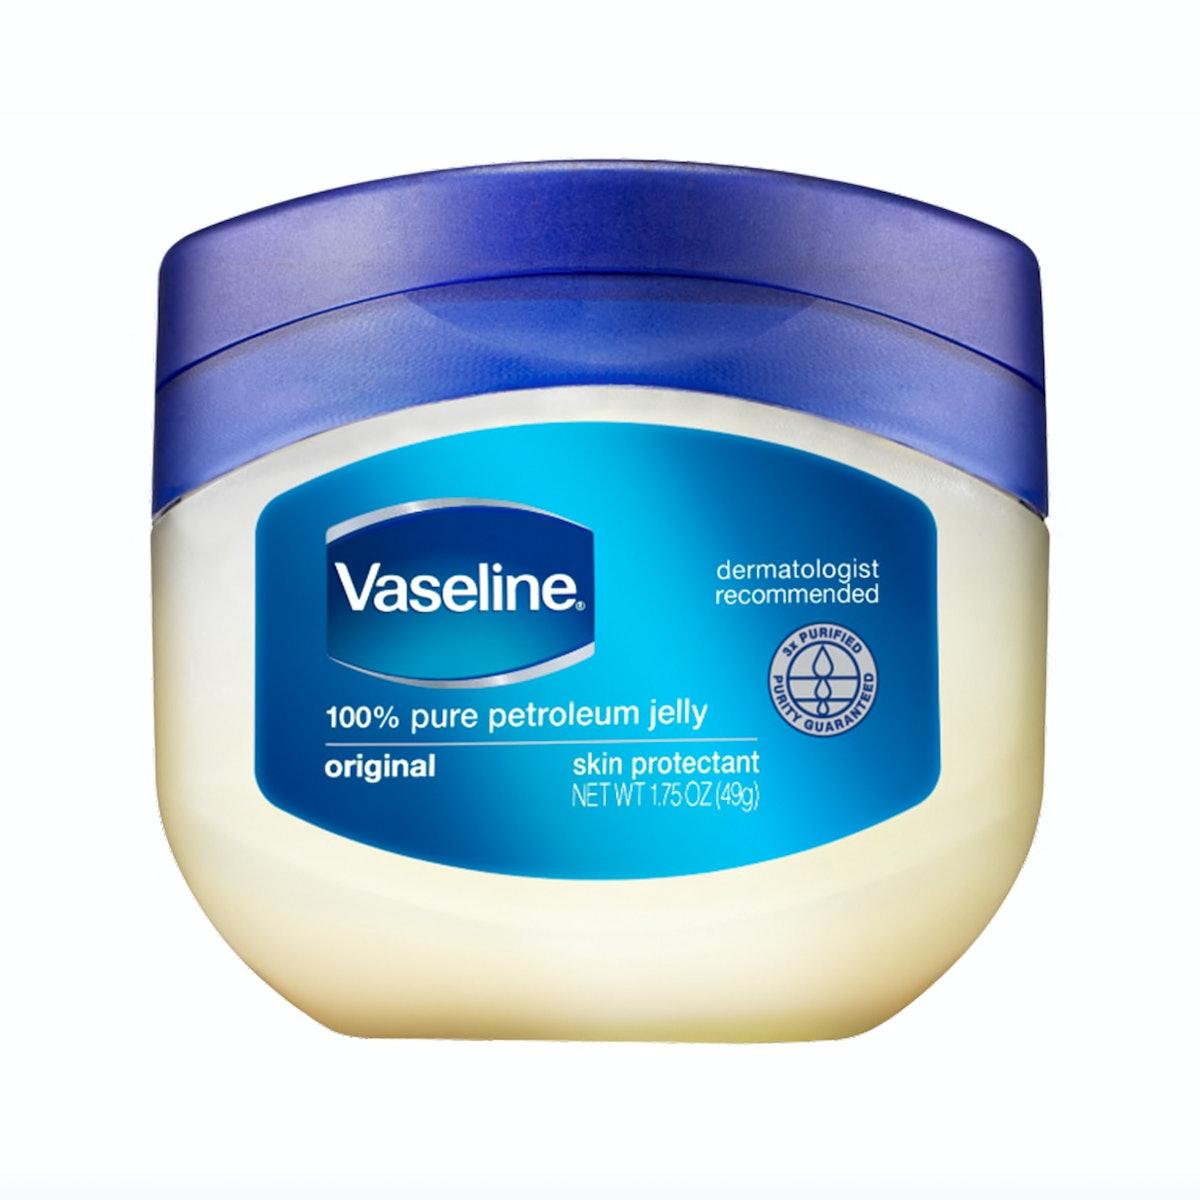 Vaseline Original Skin Protectant Petroleum Jelly